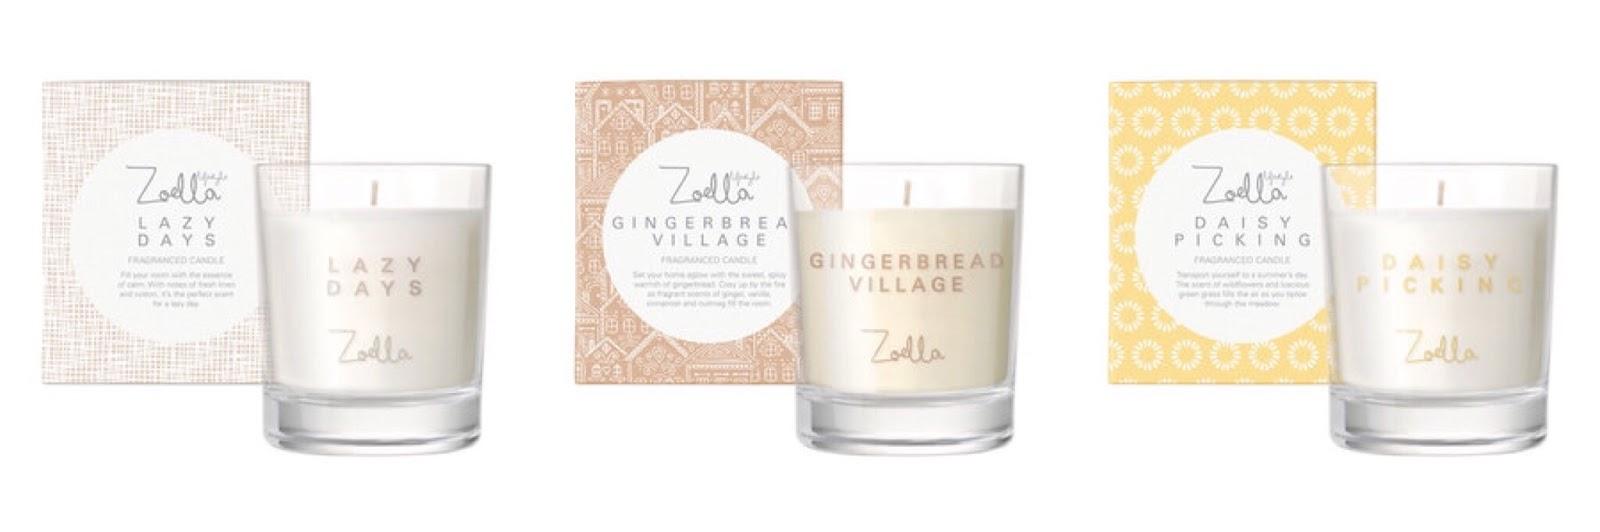 Zoella Candles